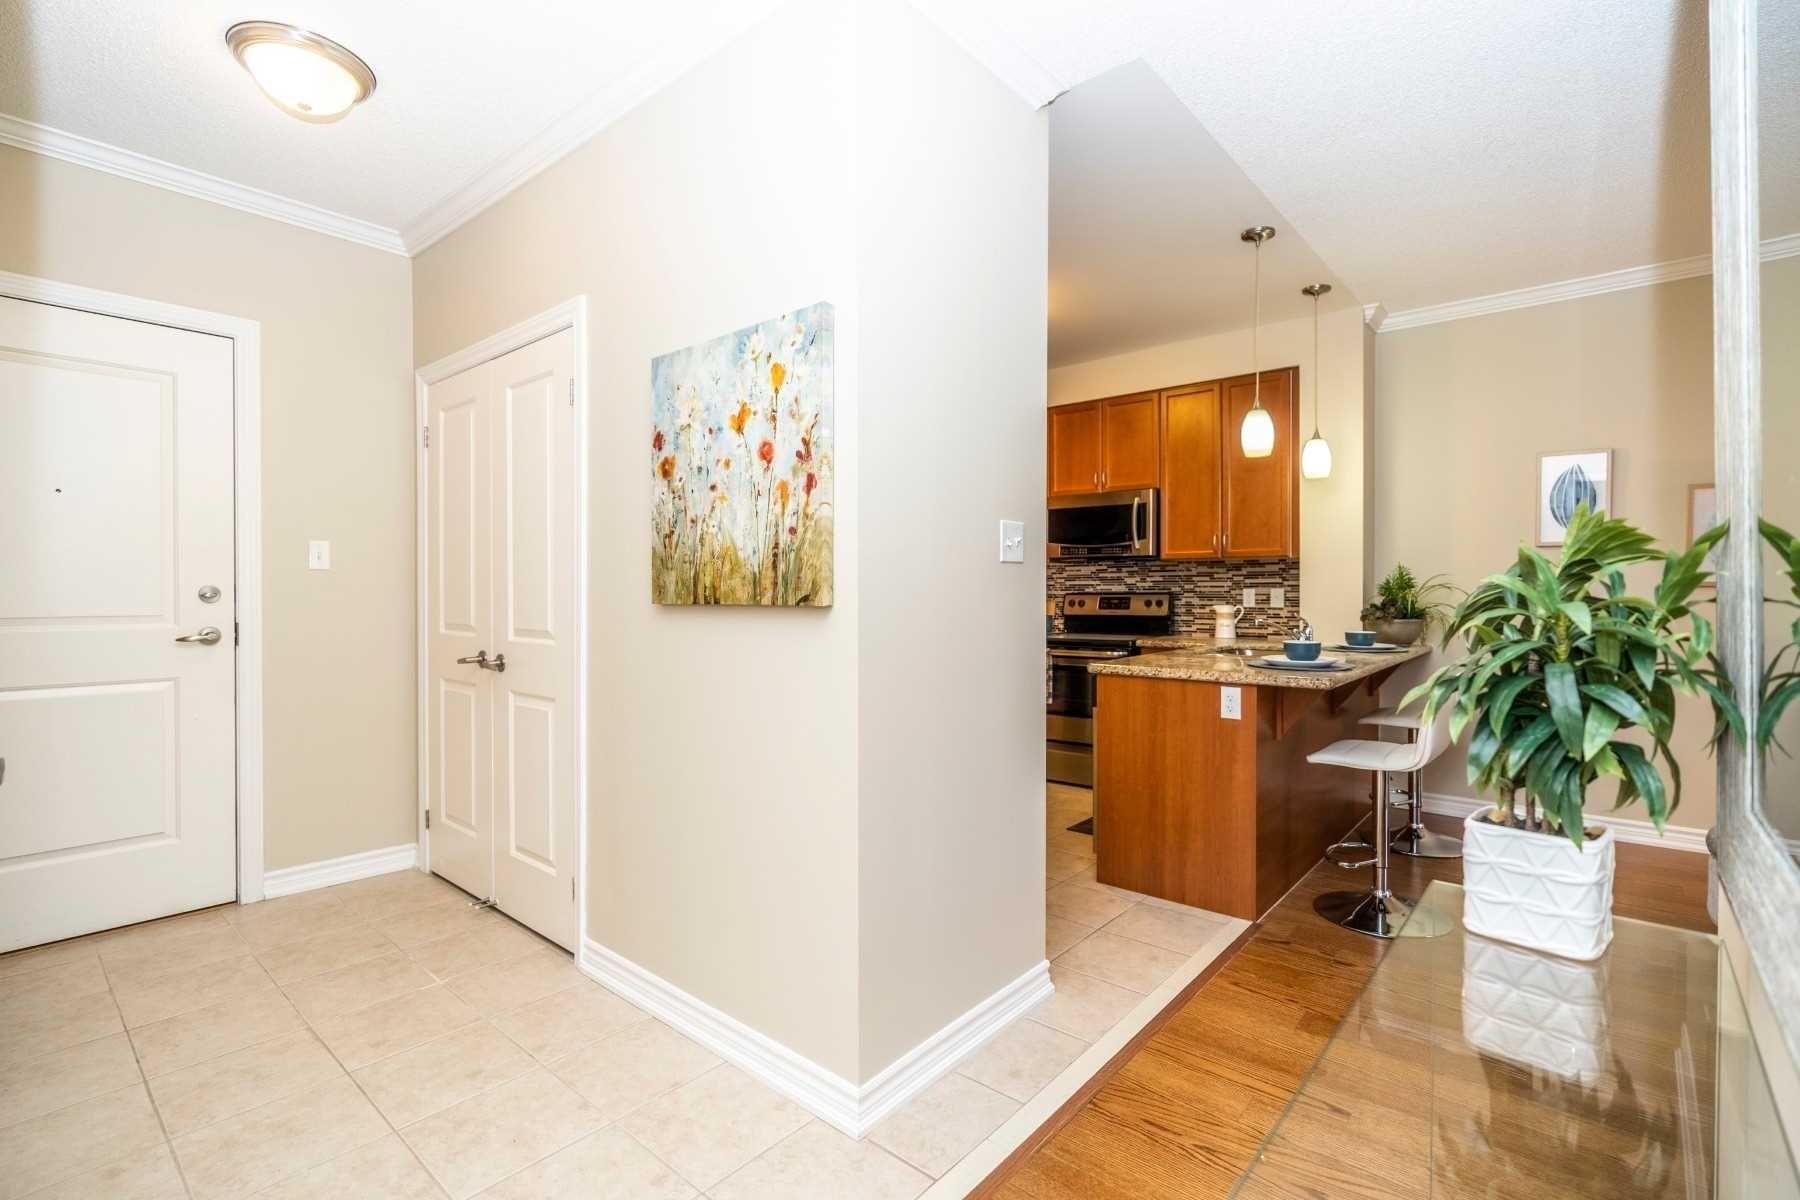 Photo 3: Photos: 213 54 Harvey Johnston Way in Whitby: Brooklin Condo for sale : MLS®# E4664368